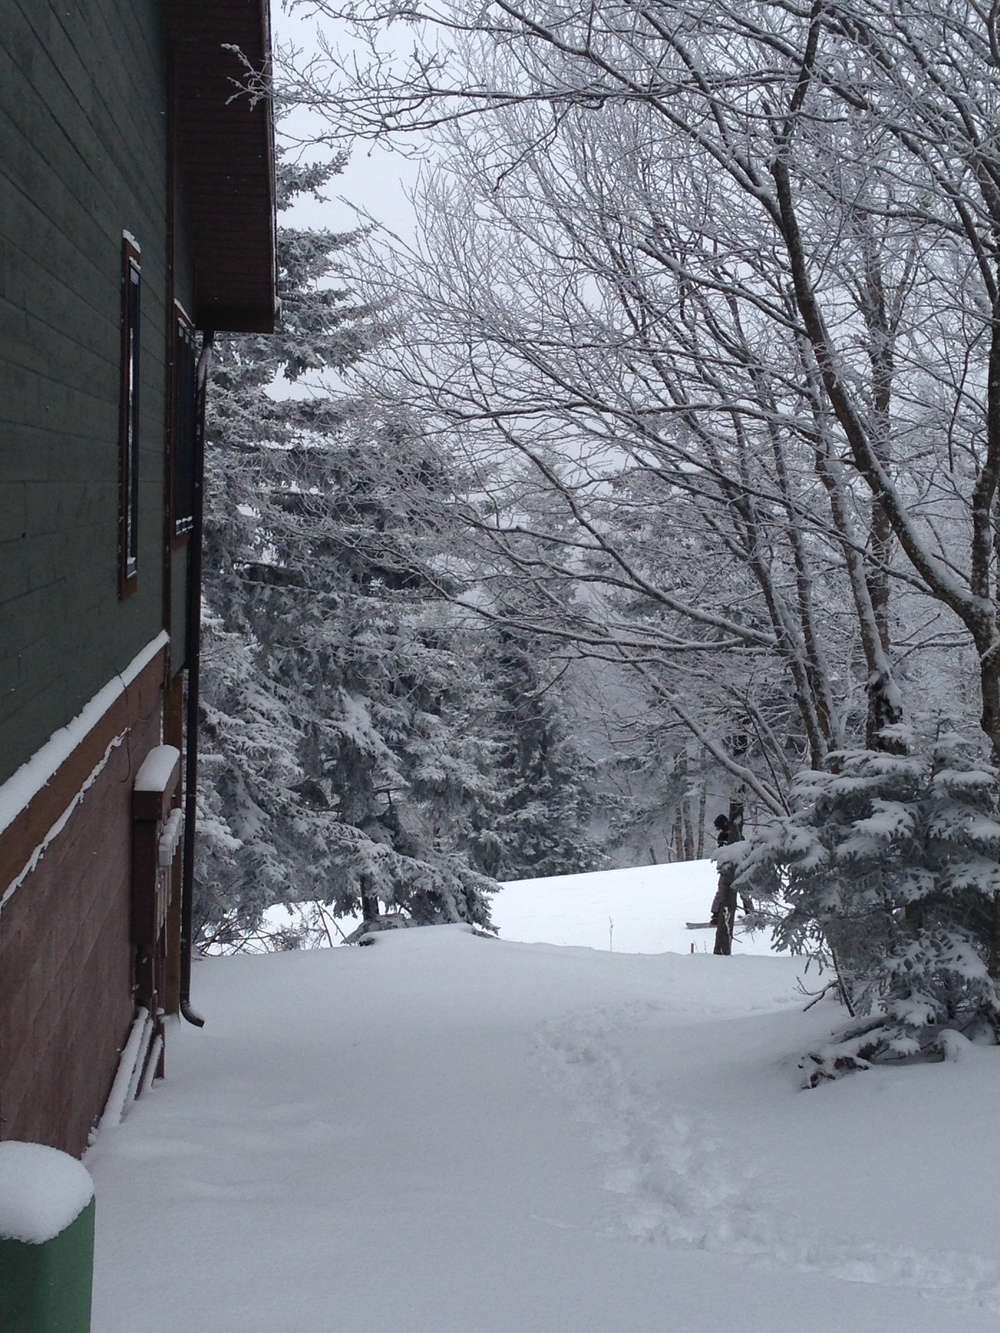 snow at snowshoe house.JPG